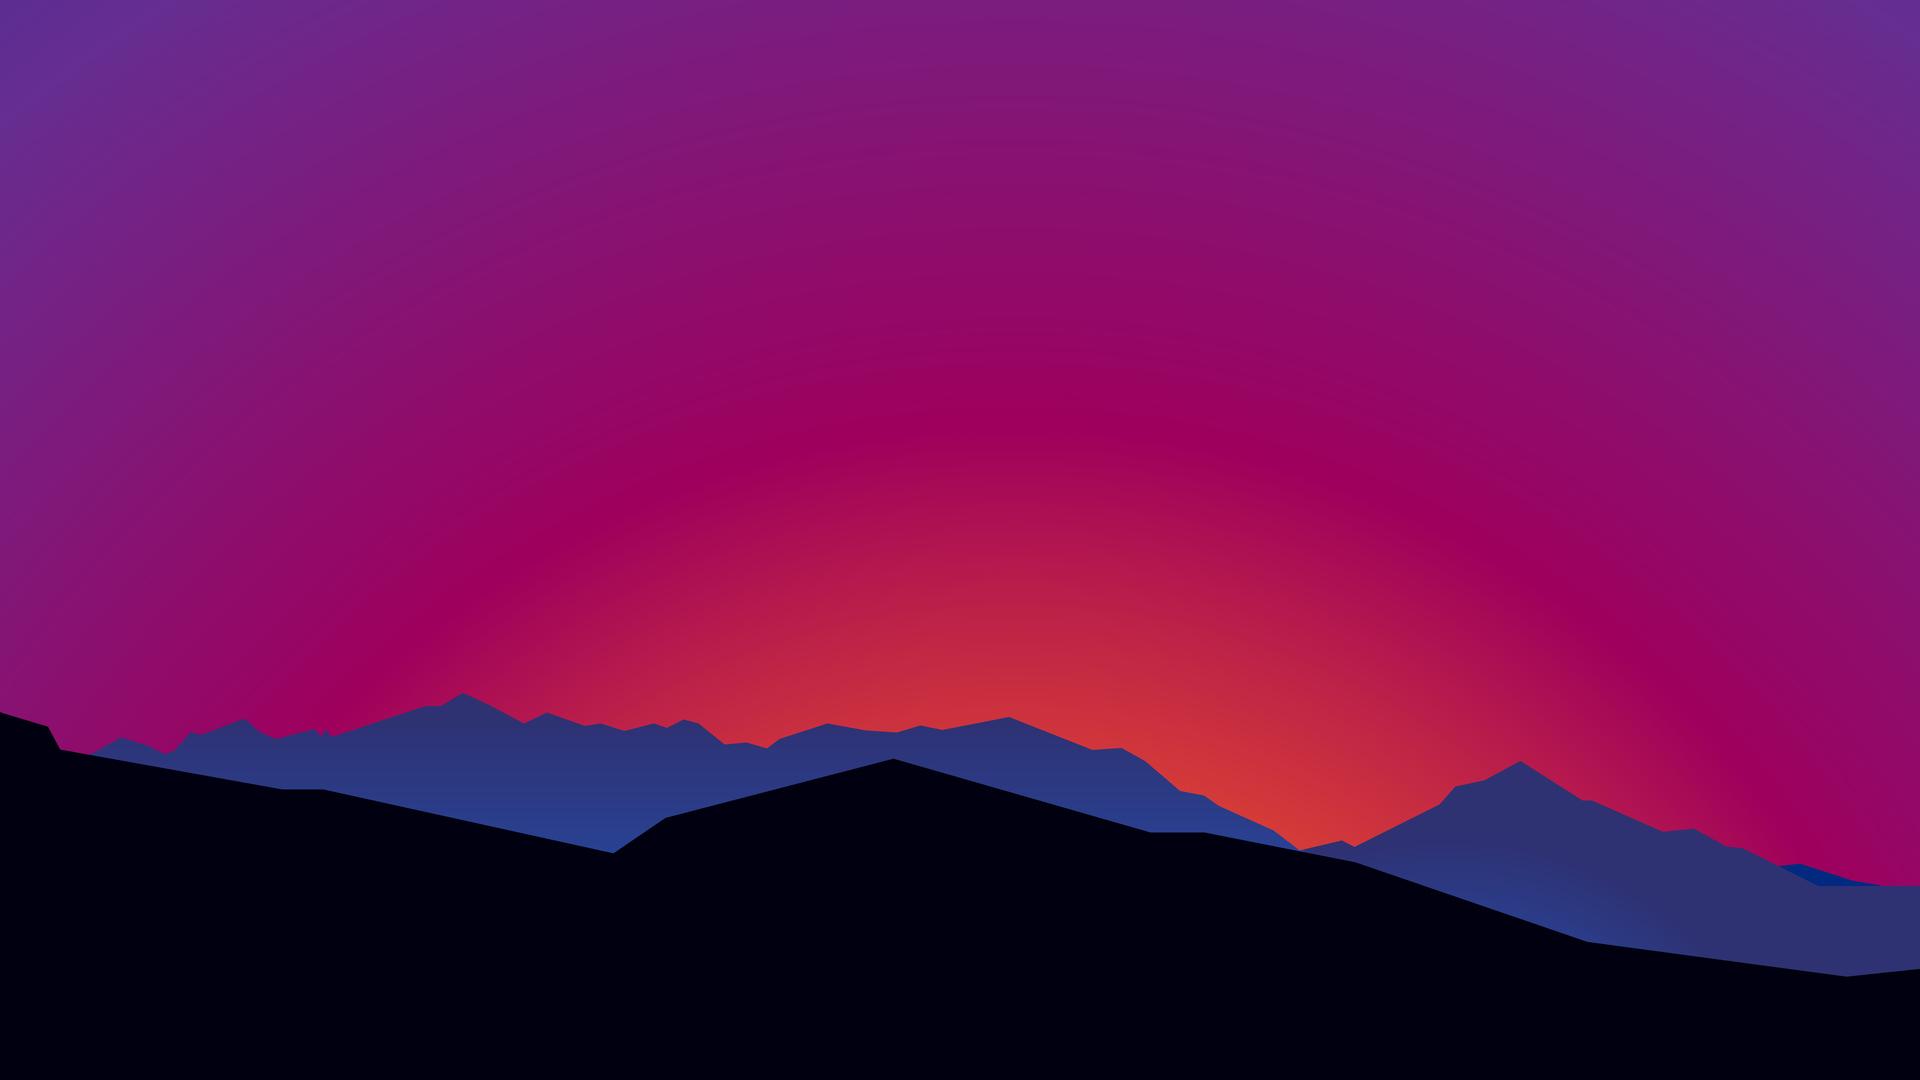 1920x1080 Mountain Landscape Sunset Minimalist 15k Laptop ...